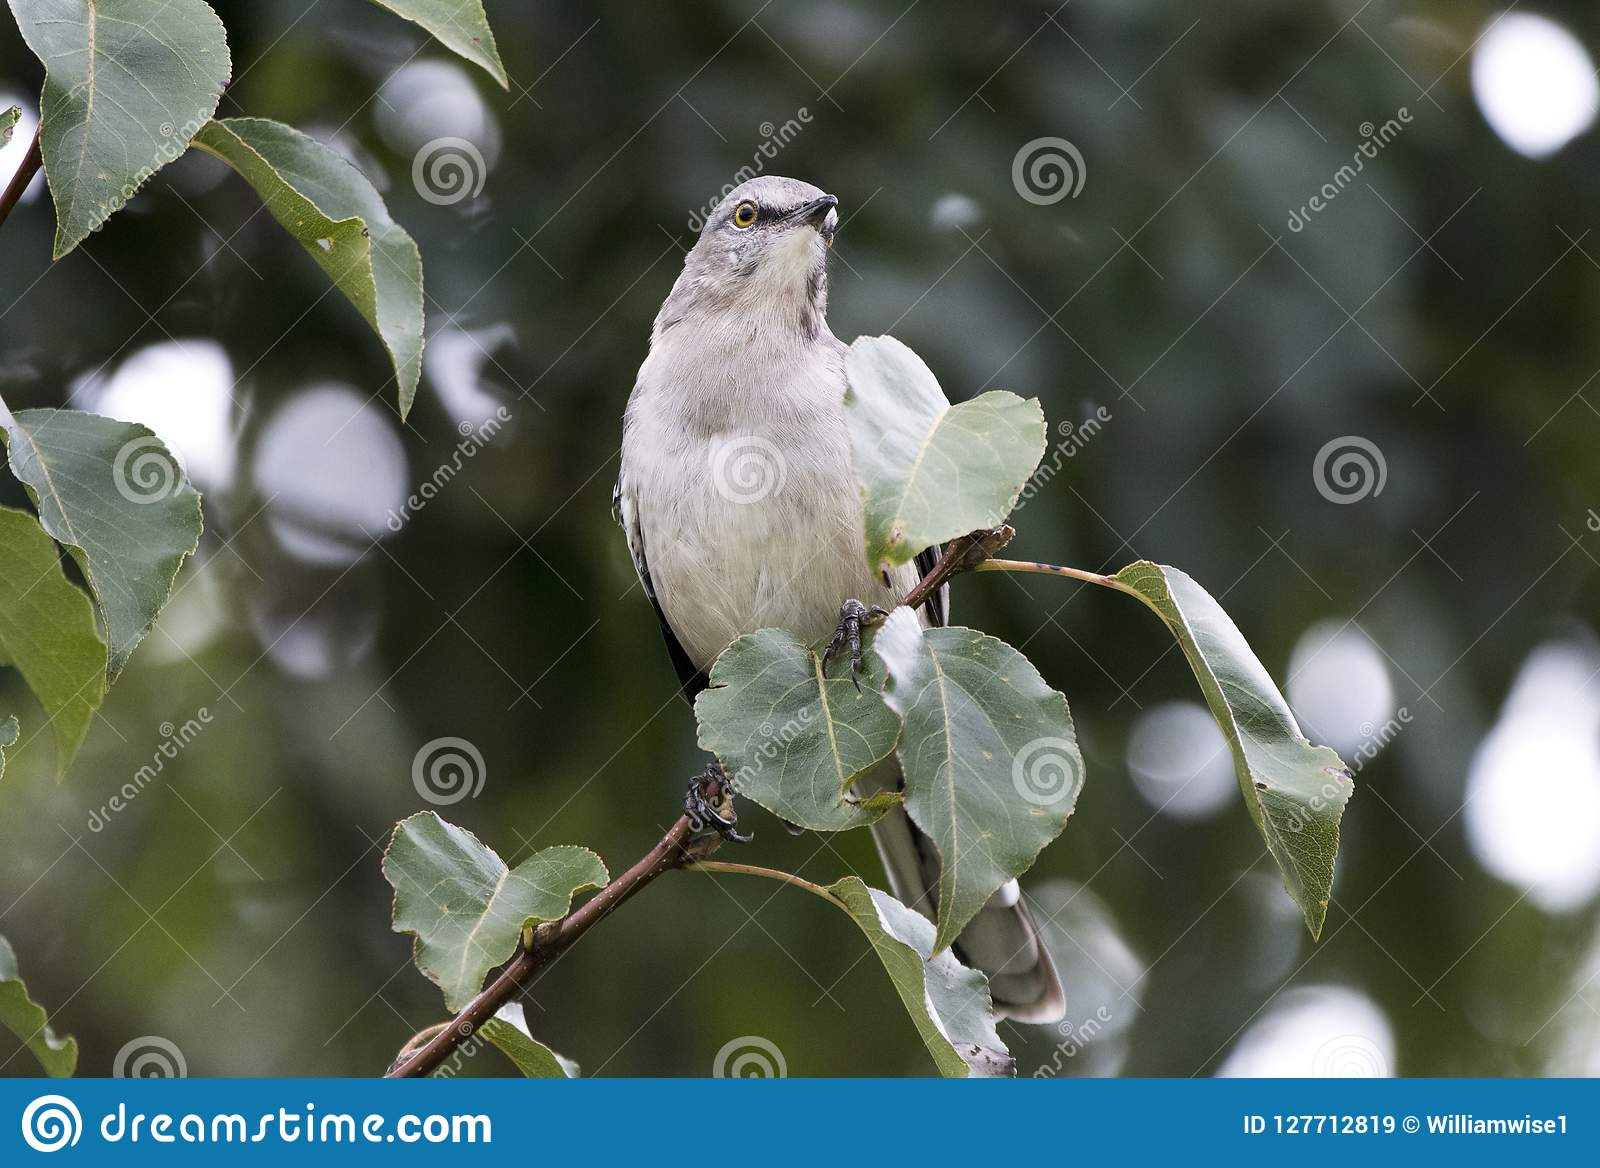 Northern Mockingbird perched in Bradford Pear Tree, Georgia